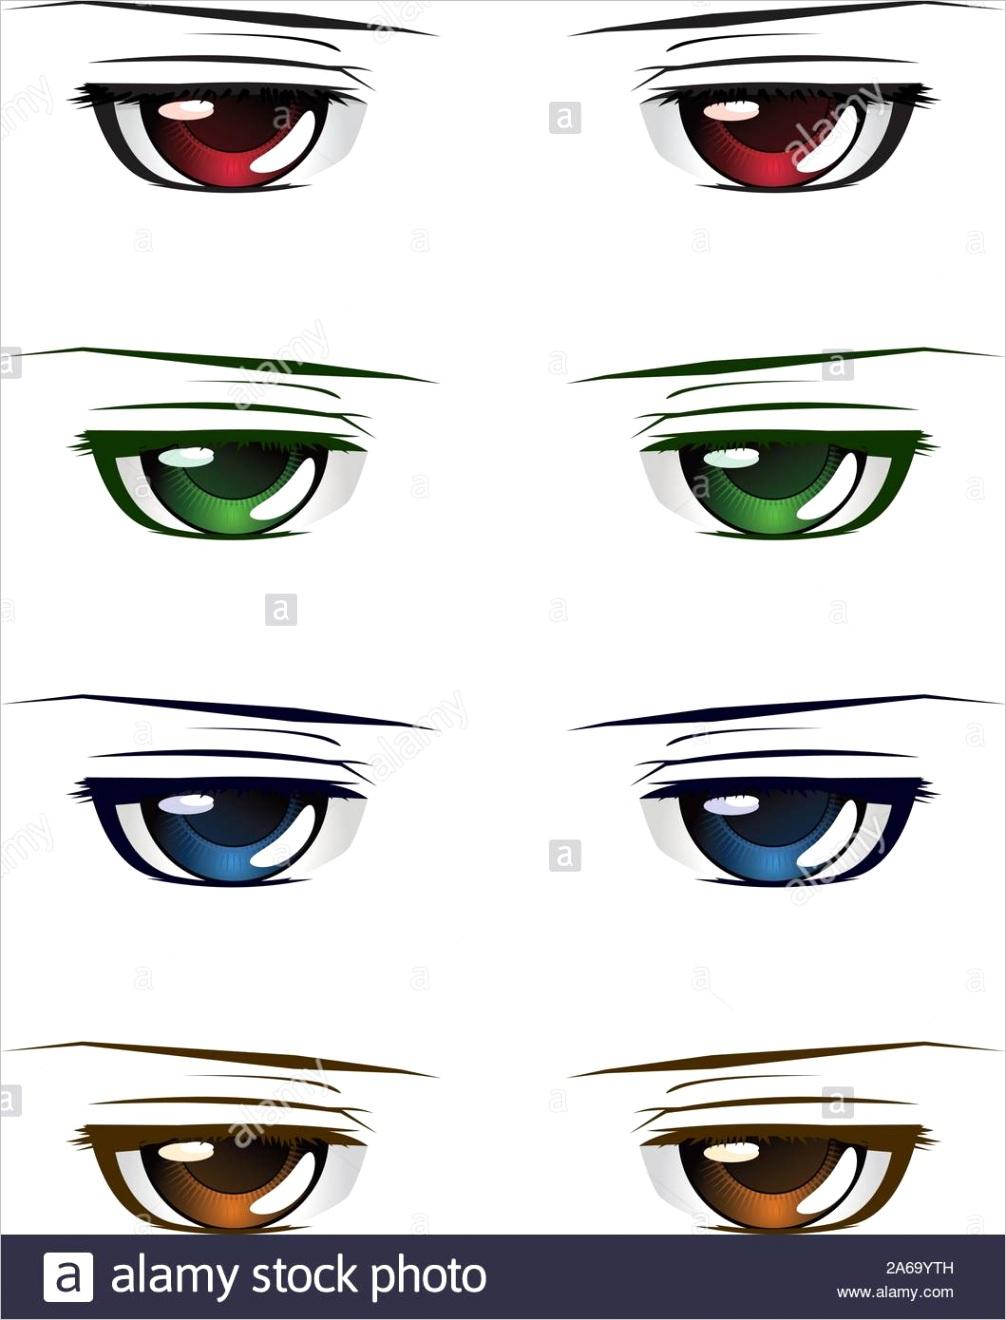 manga anime style male eyes of different colors set on white background image ml